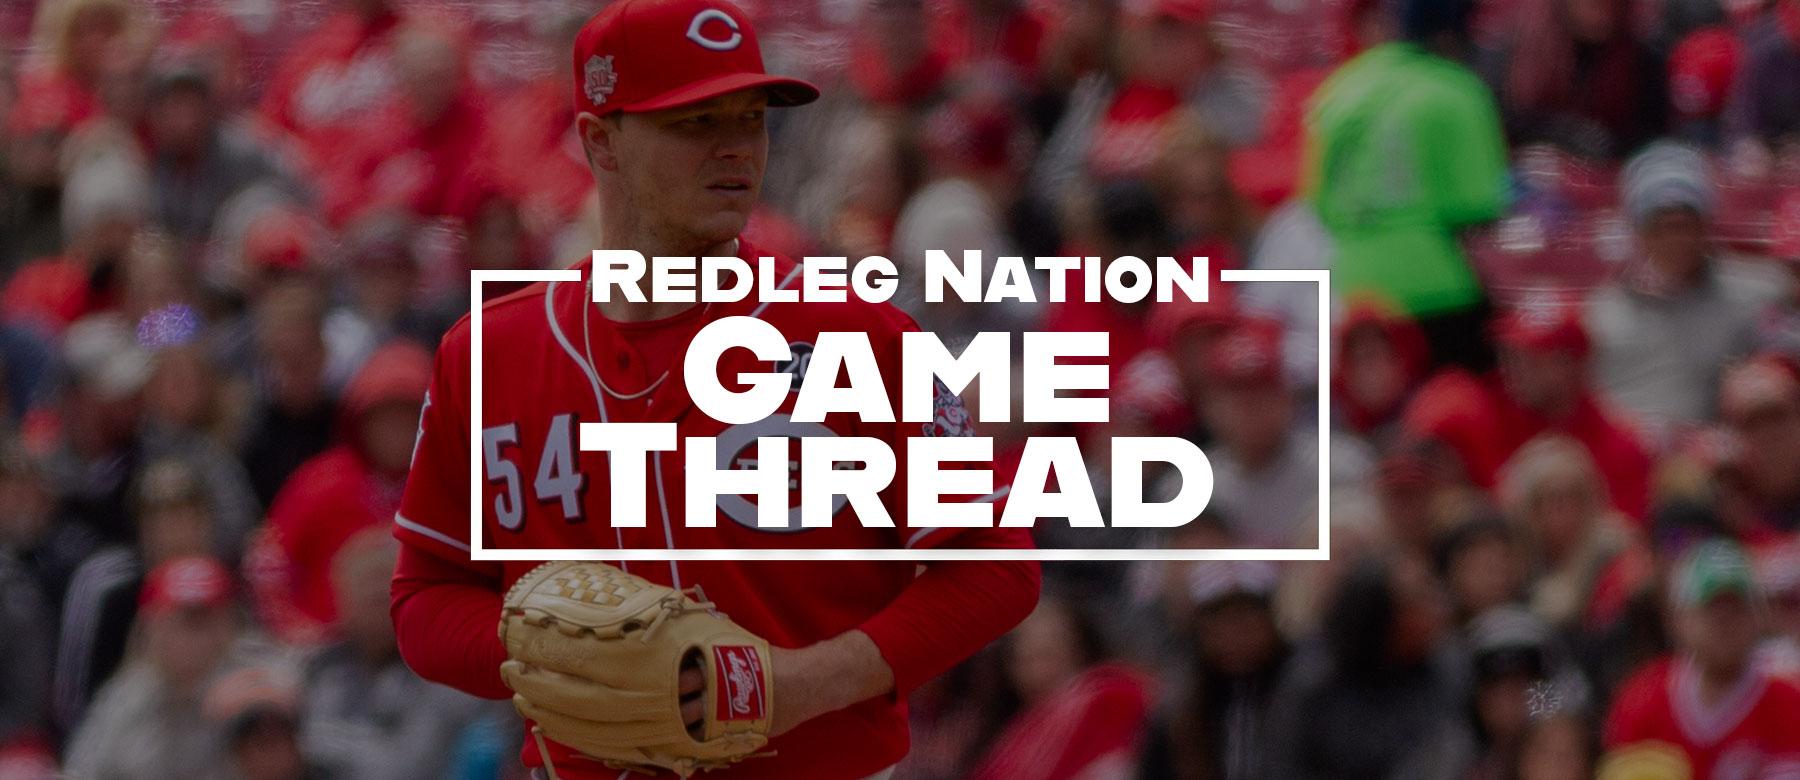 Milwaukee Brewers vs Cincinnati Reds - July 3, 2019 - Redleg Nation